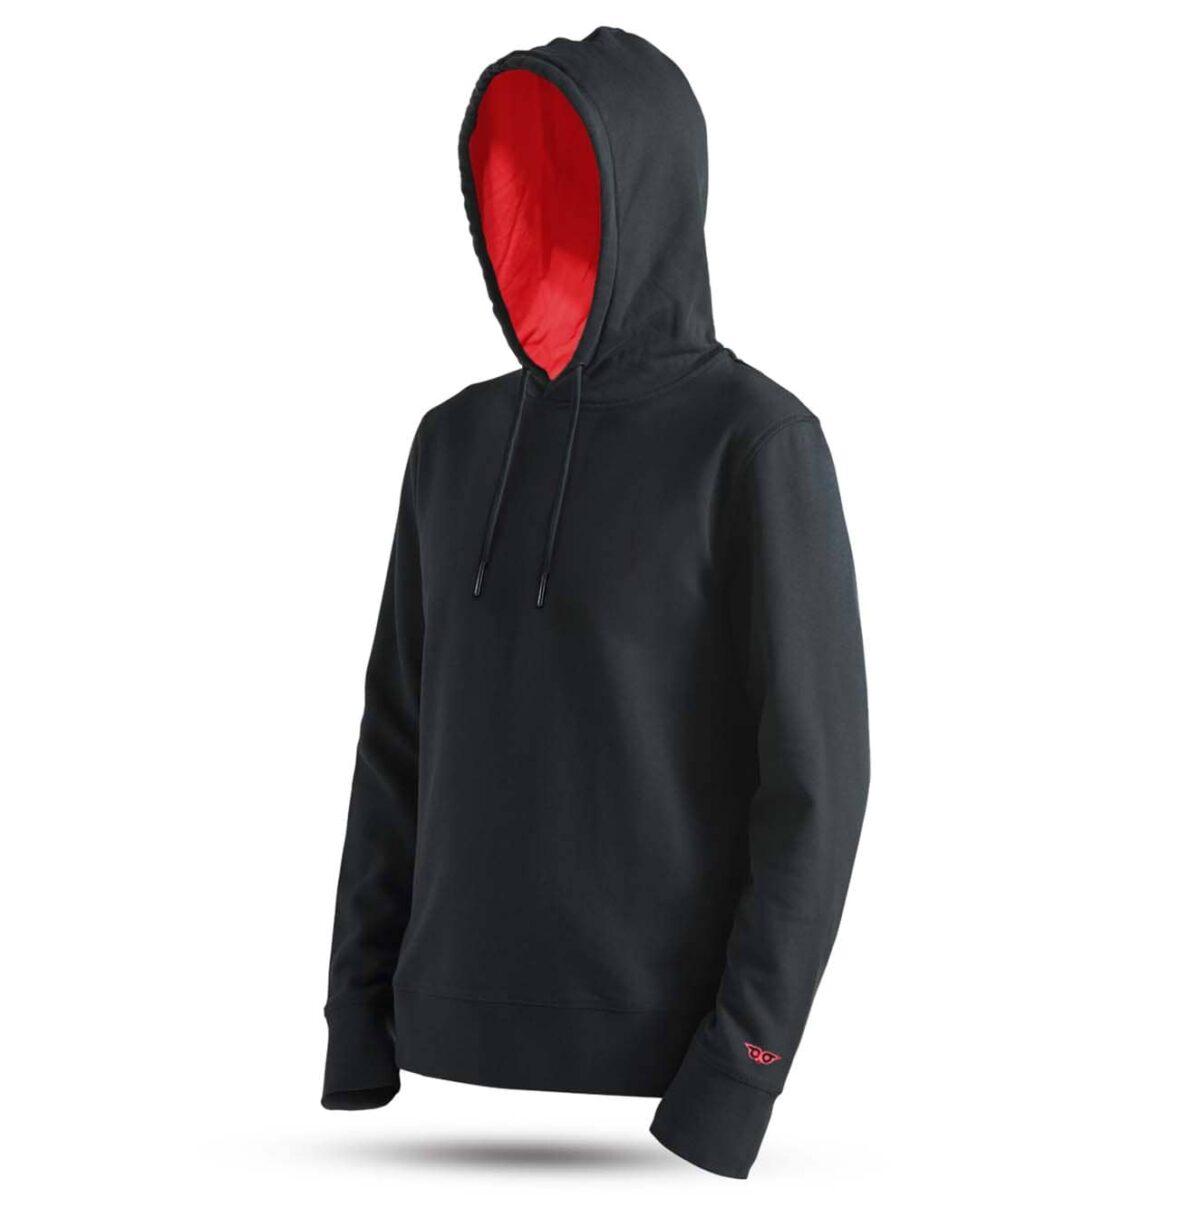 tarrzz-tasarim-kapsonlu-sweatshirt-basic-baskisiz-sade-sweatshirt